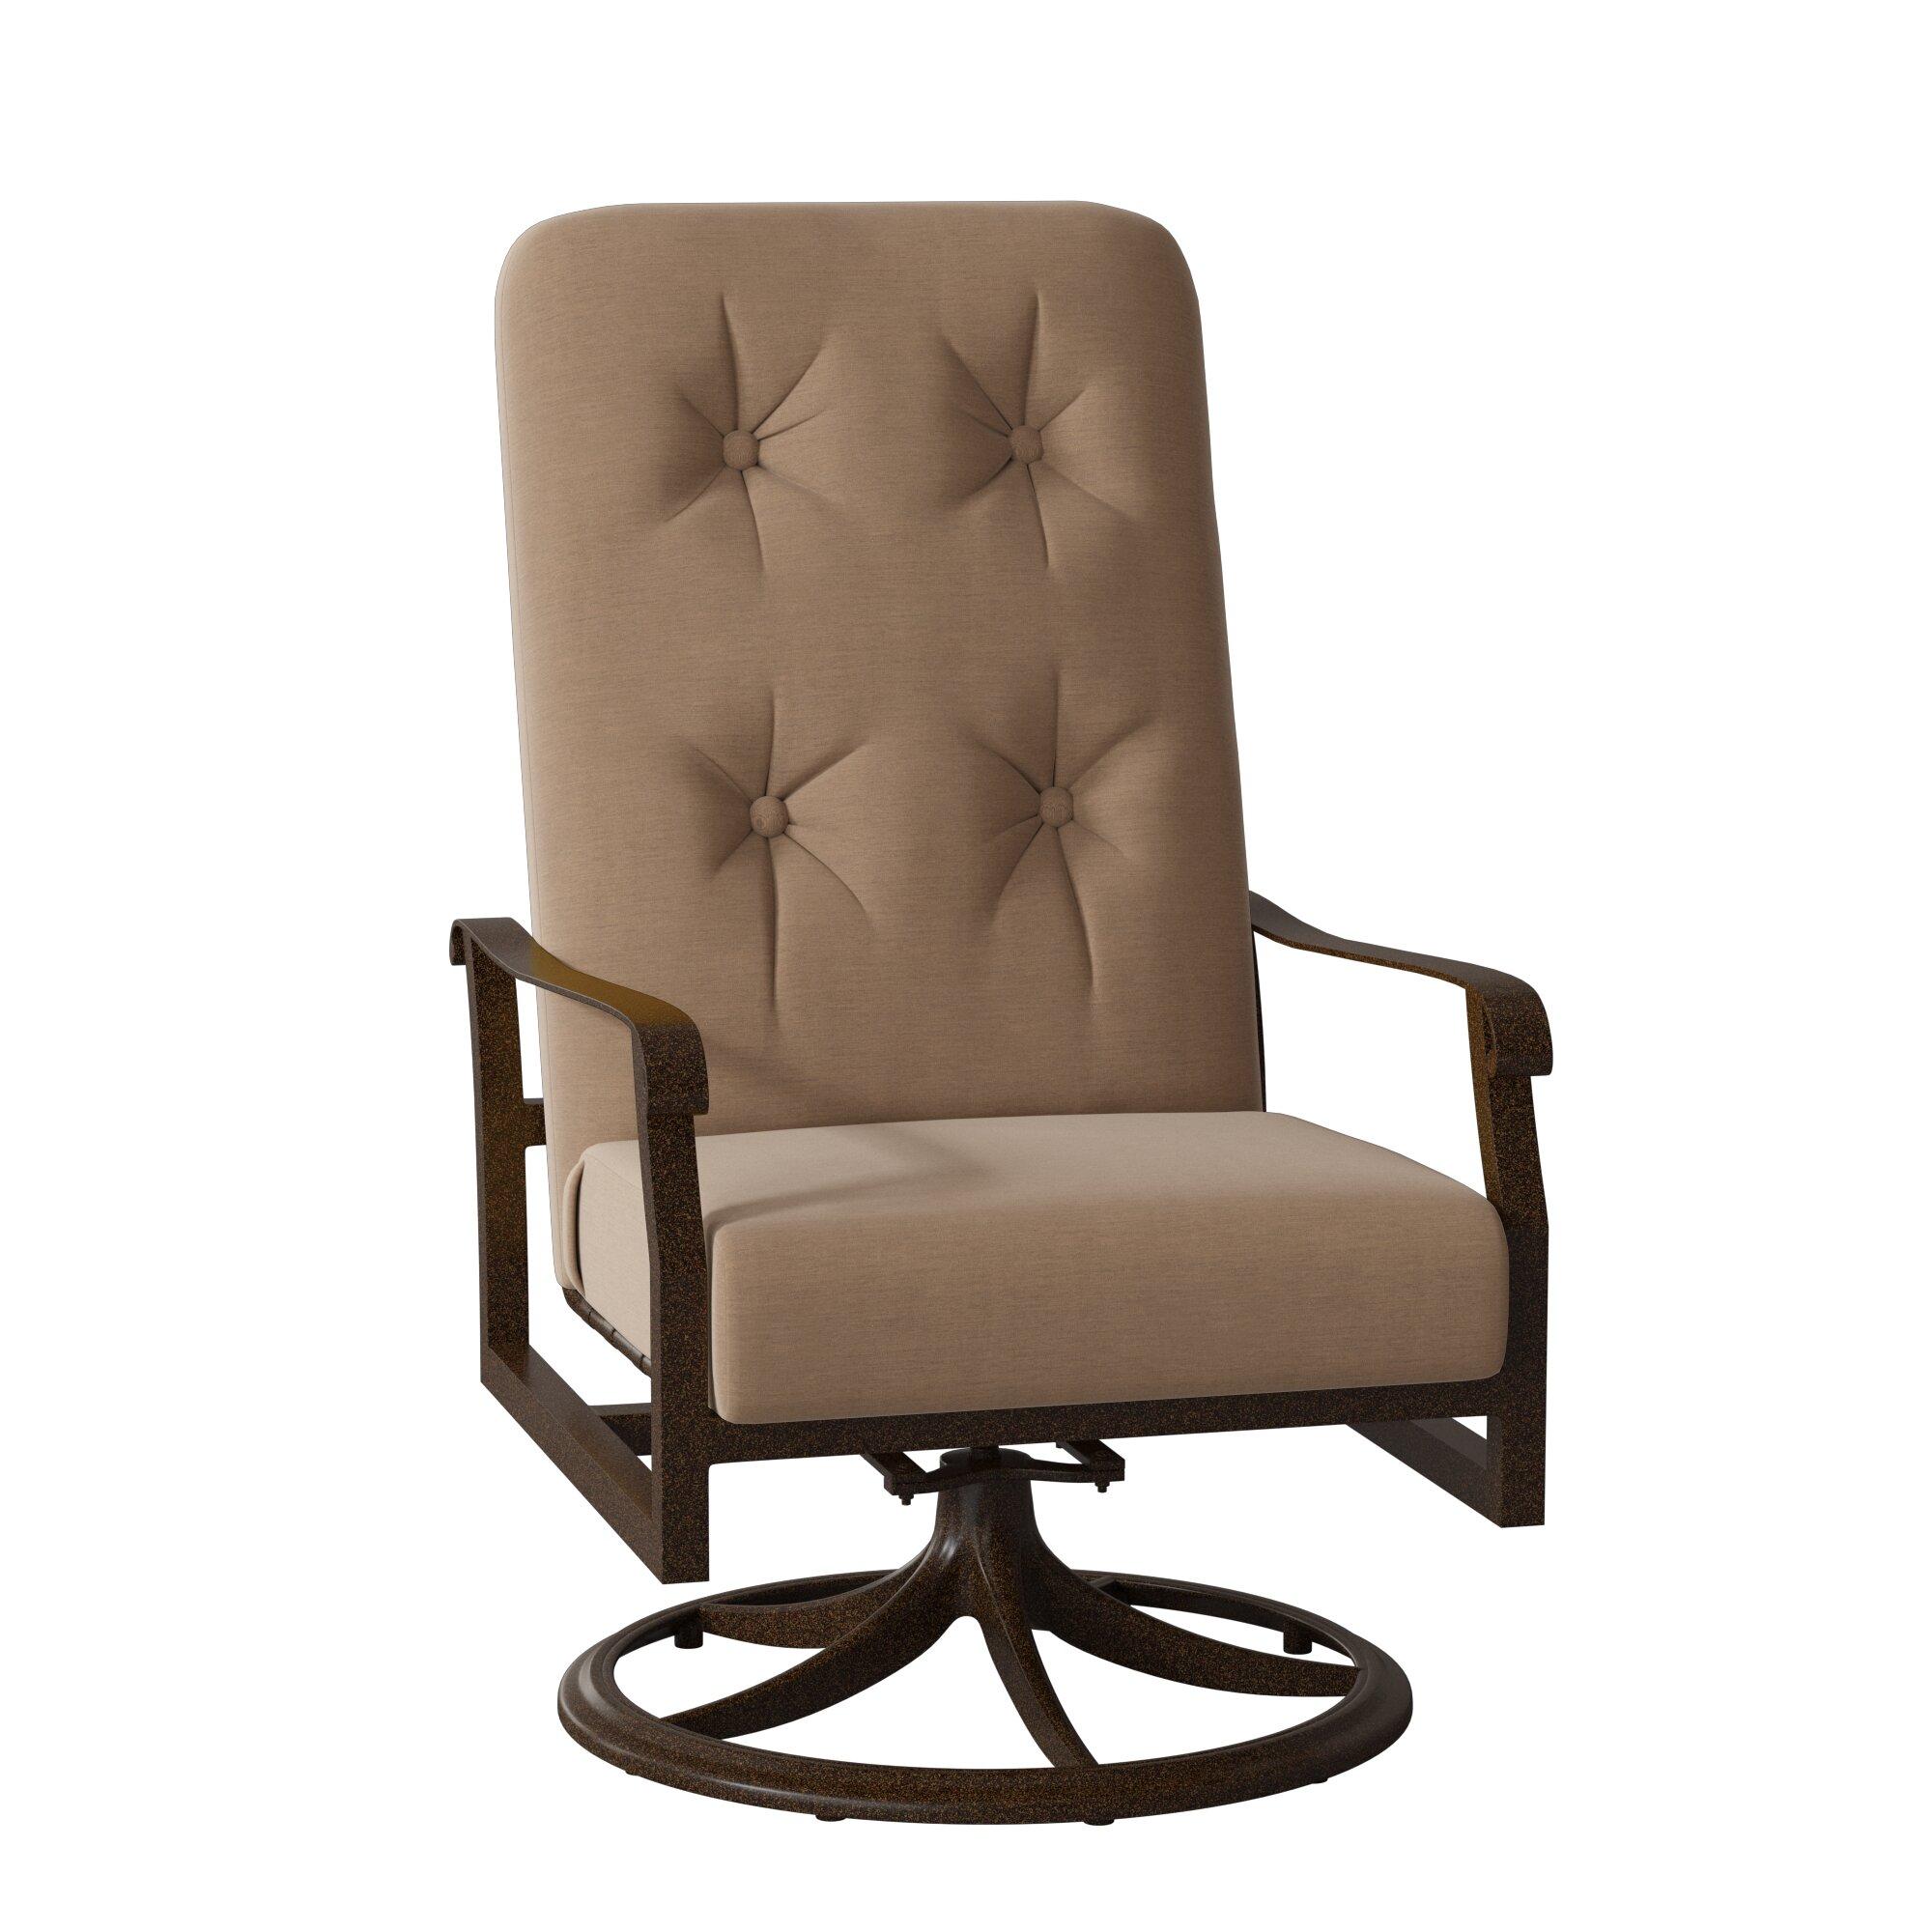 Cortland High Back Swivel Rocking Chair With Cushions